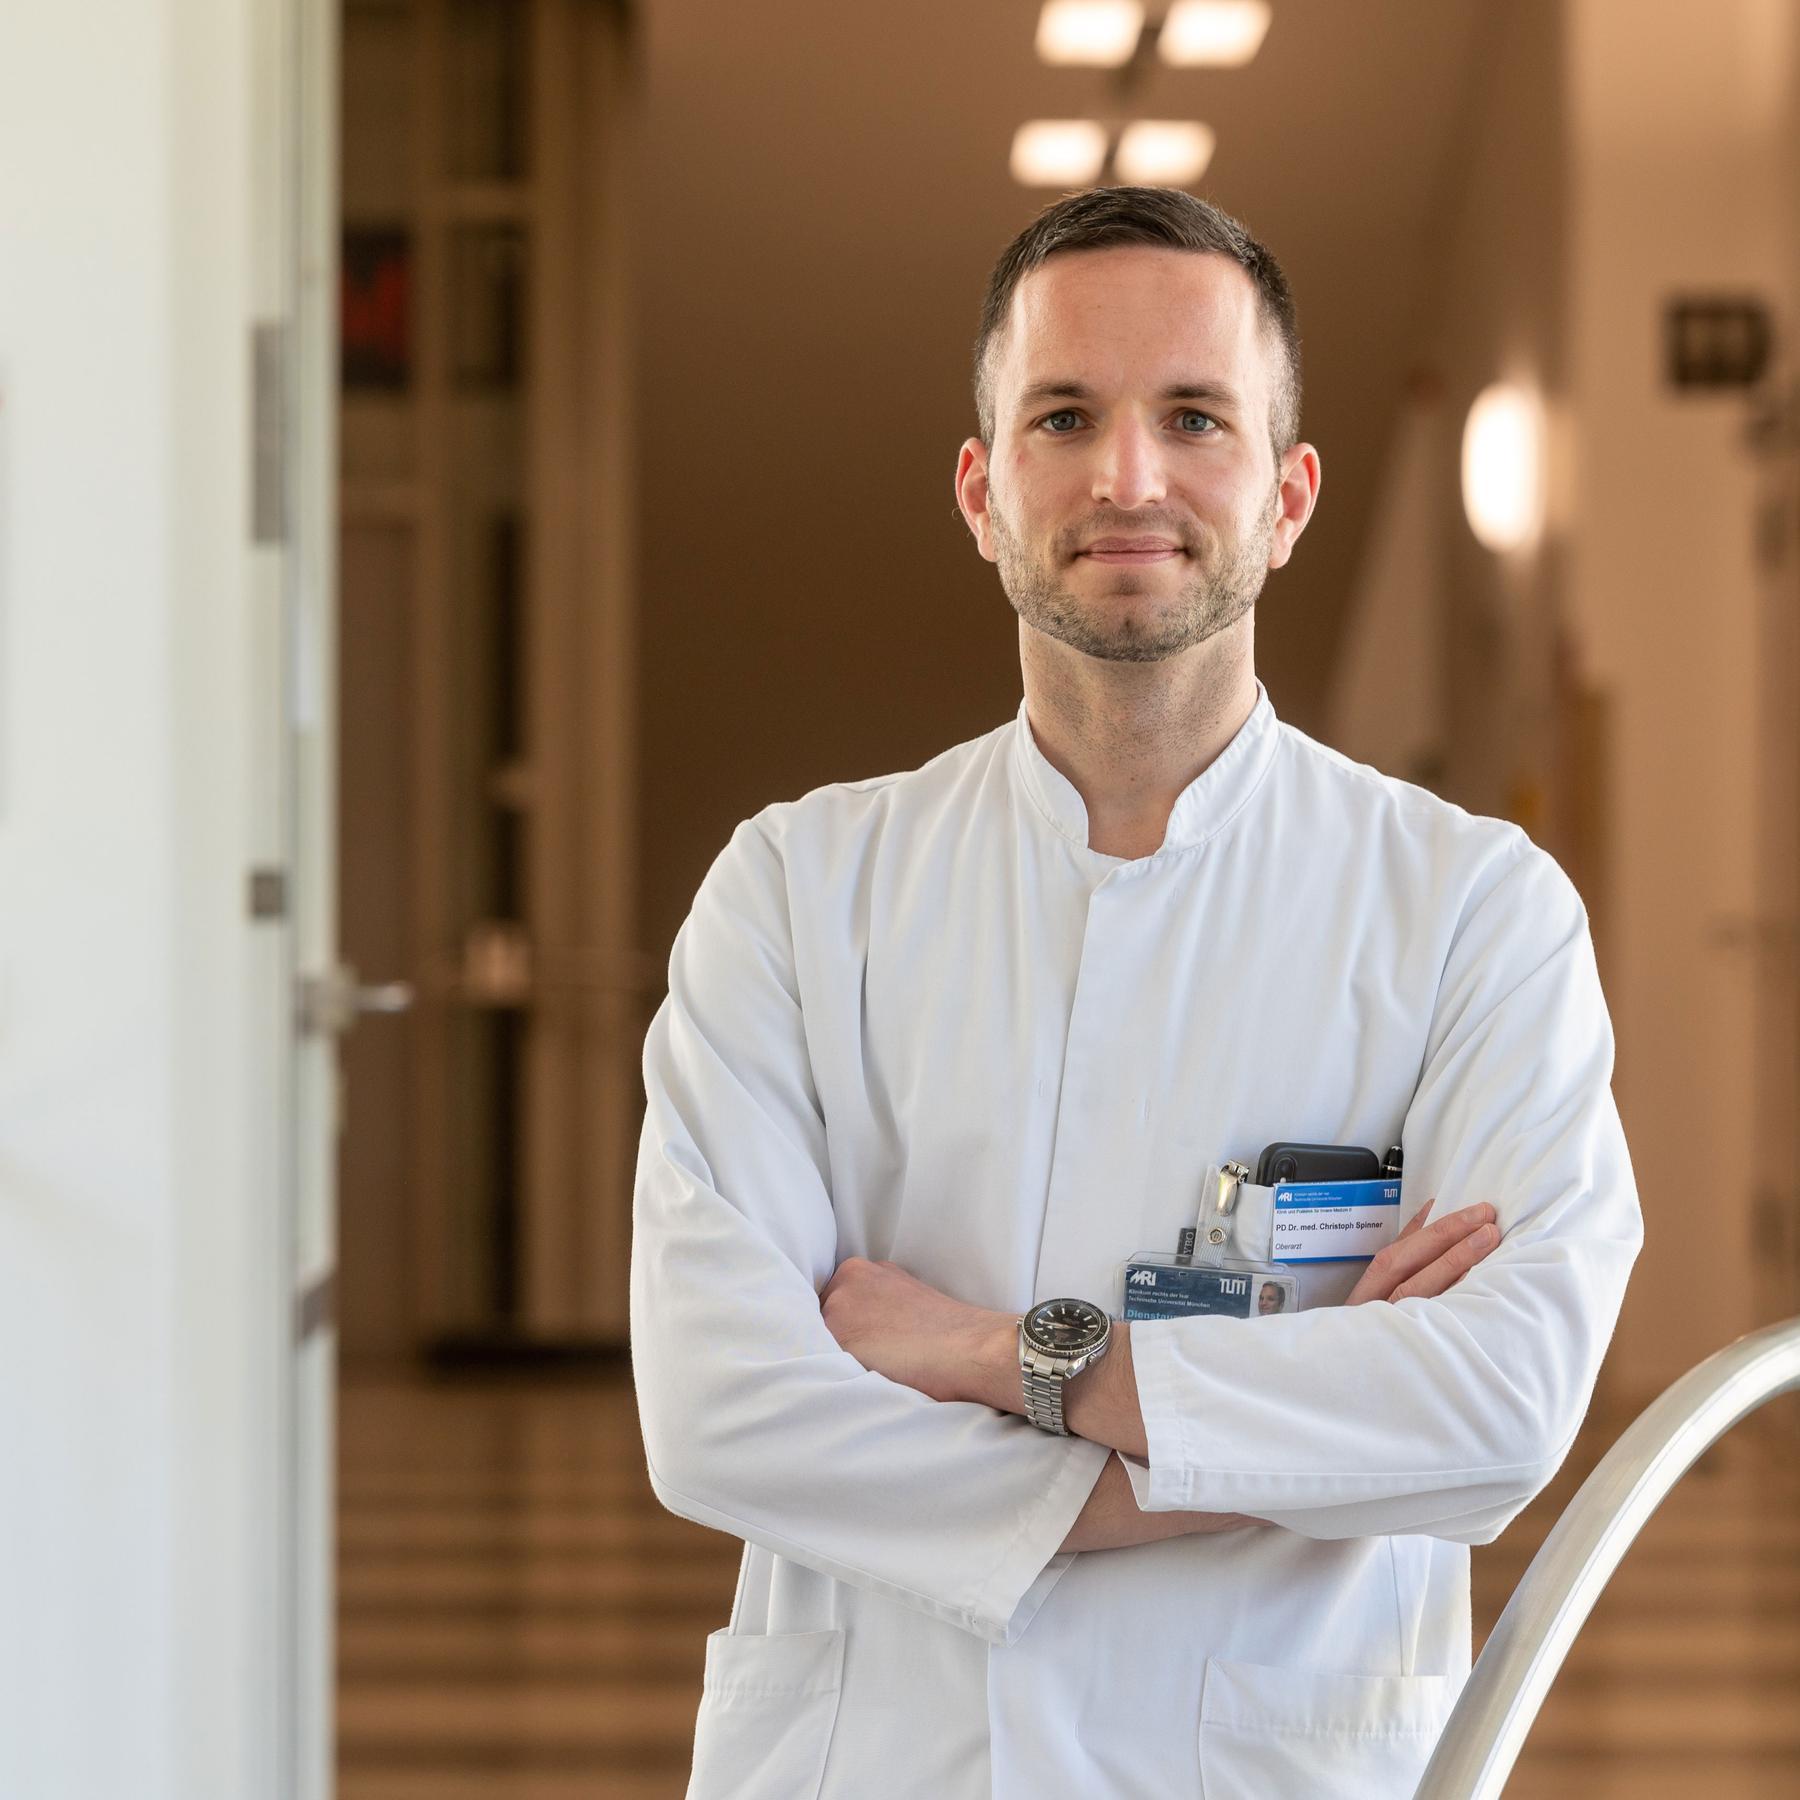 Corona-News mit Dr. Christoph Spinner (08.06.2021)